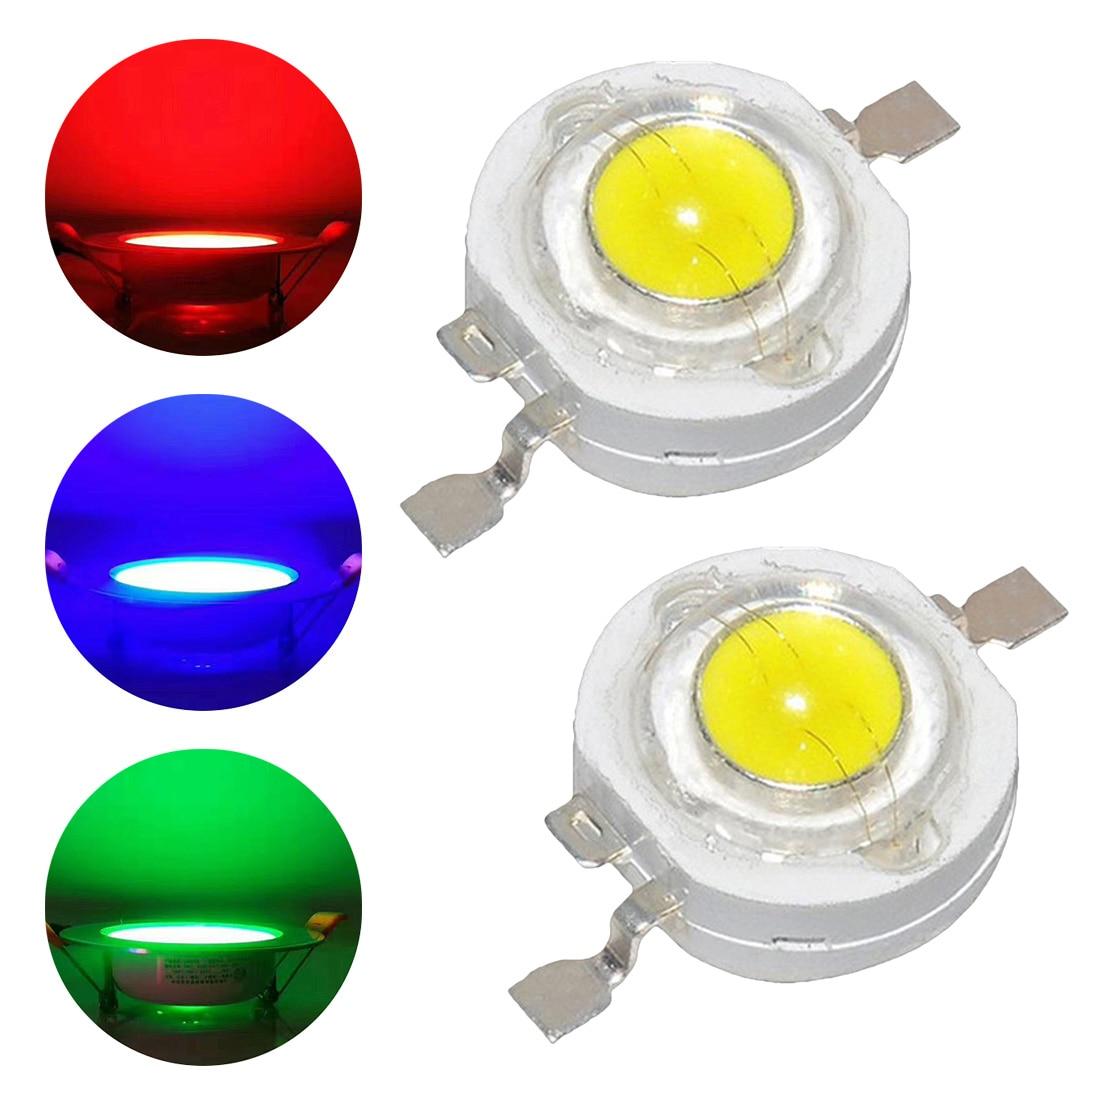 1Pc 1W 3W Spot Light LED Lamp Real Full Watt High Power Bulb Diodes LEDs Chip For 3W - 18W Downlight